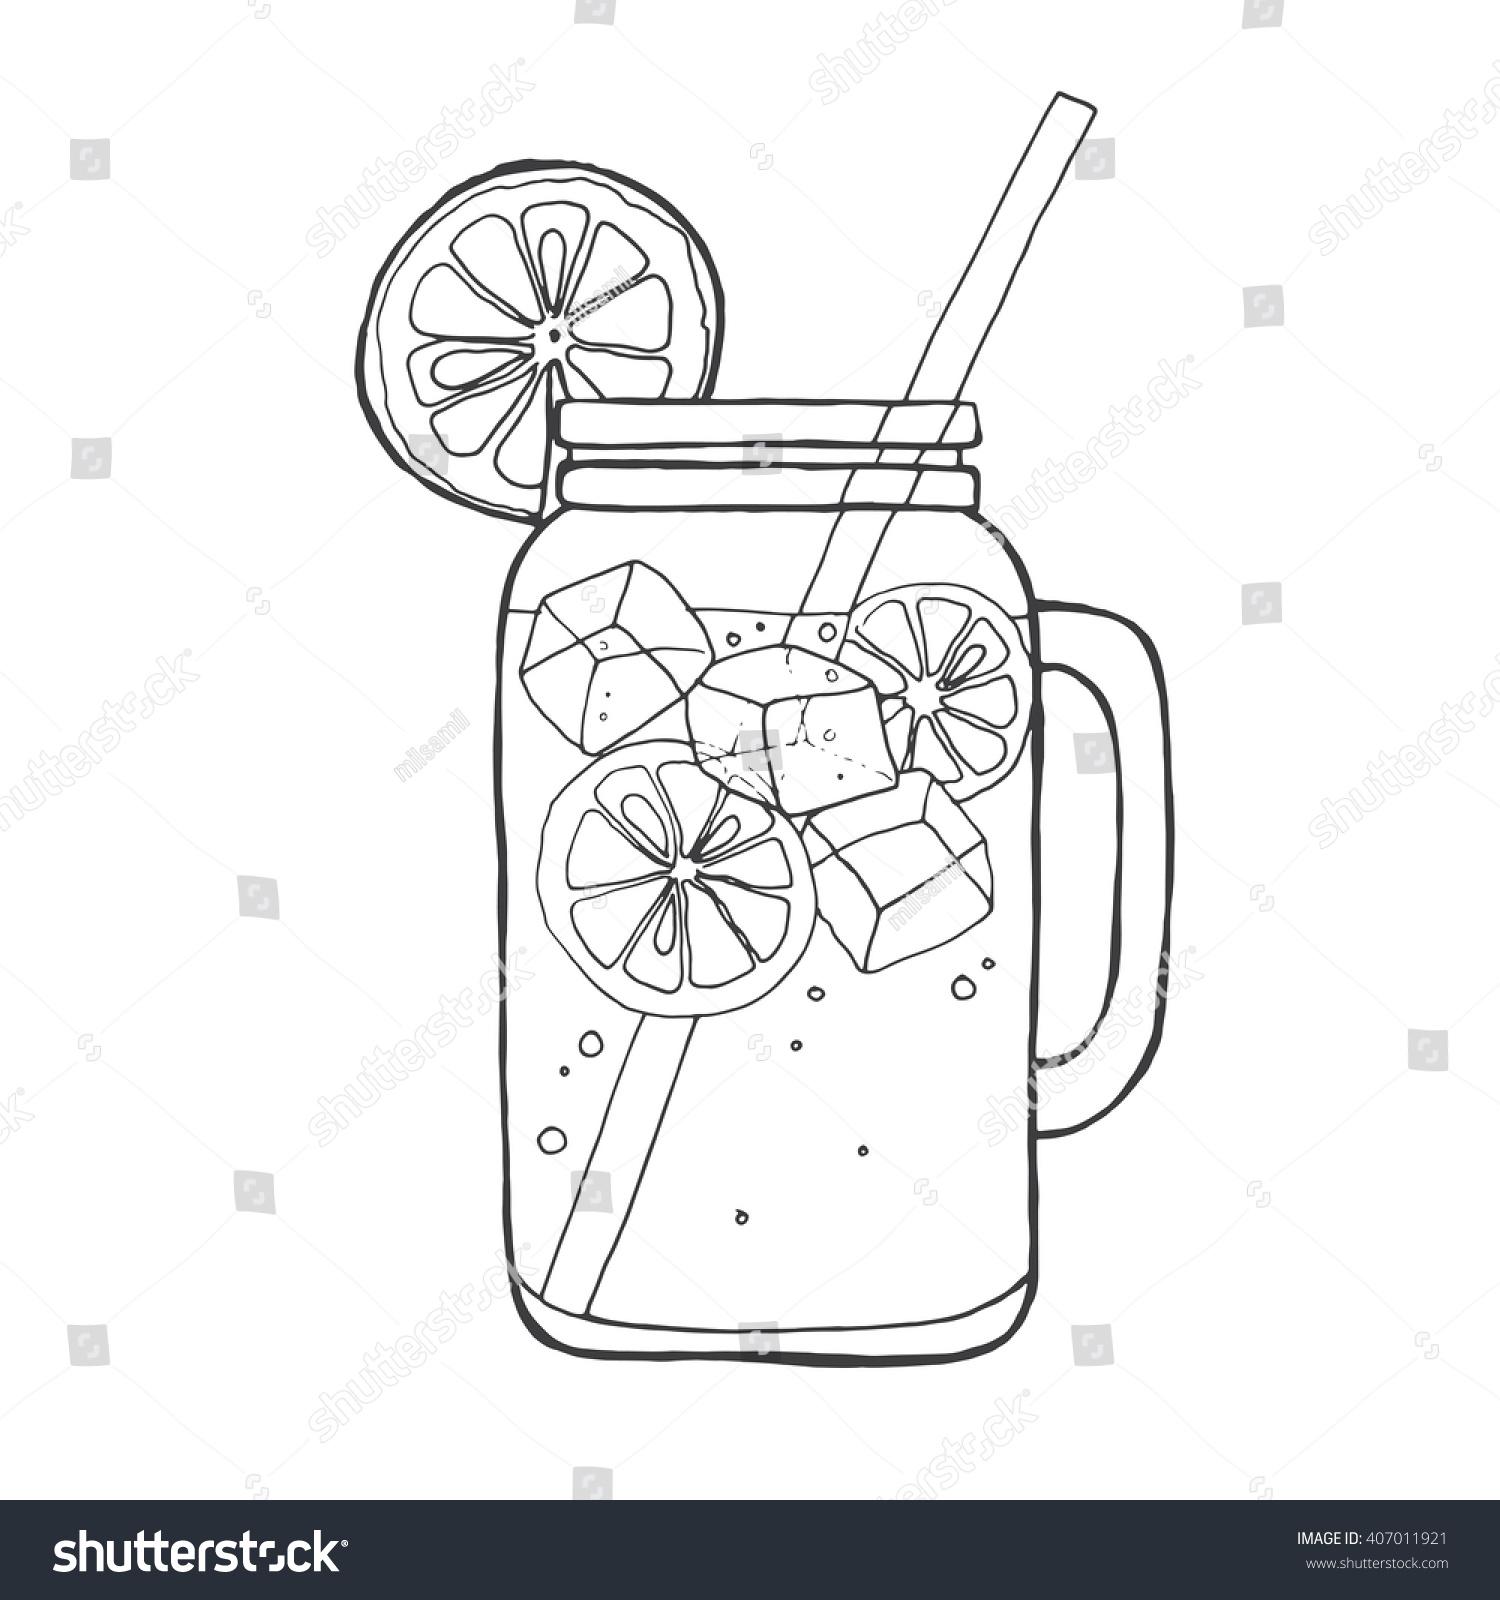 lemonade clipart black and white - photo #40